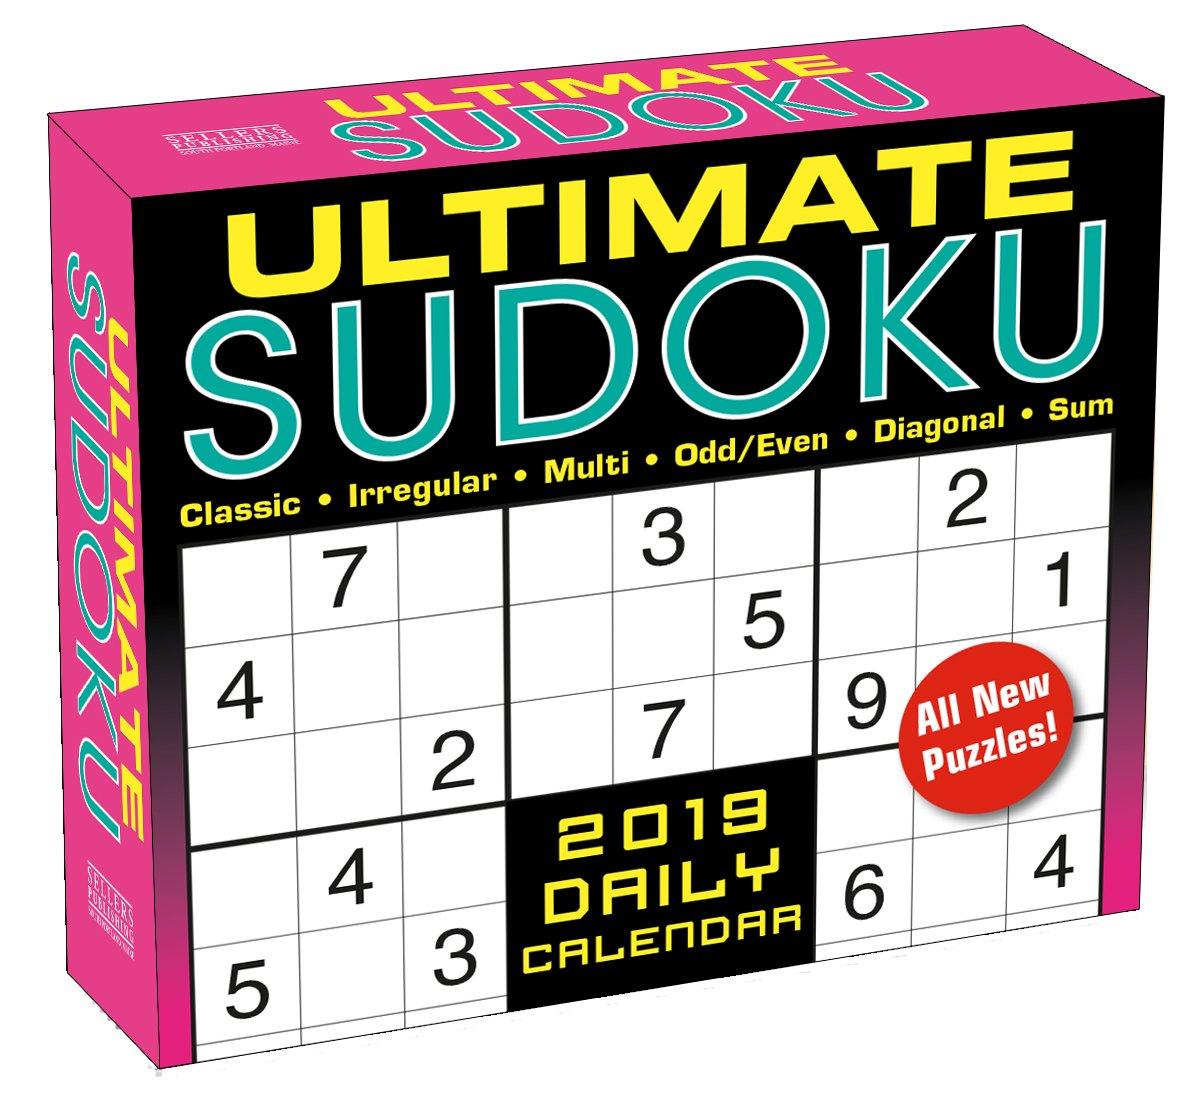 Ultimate Sudoku 2019 Boxed Daily Calendar, 6 x 5, (CB-0530)